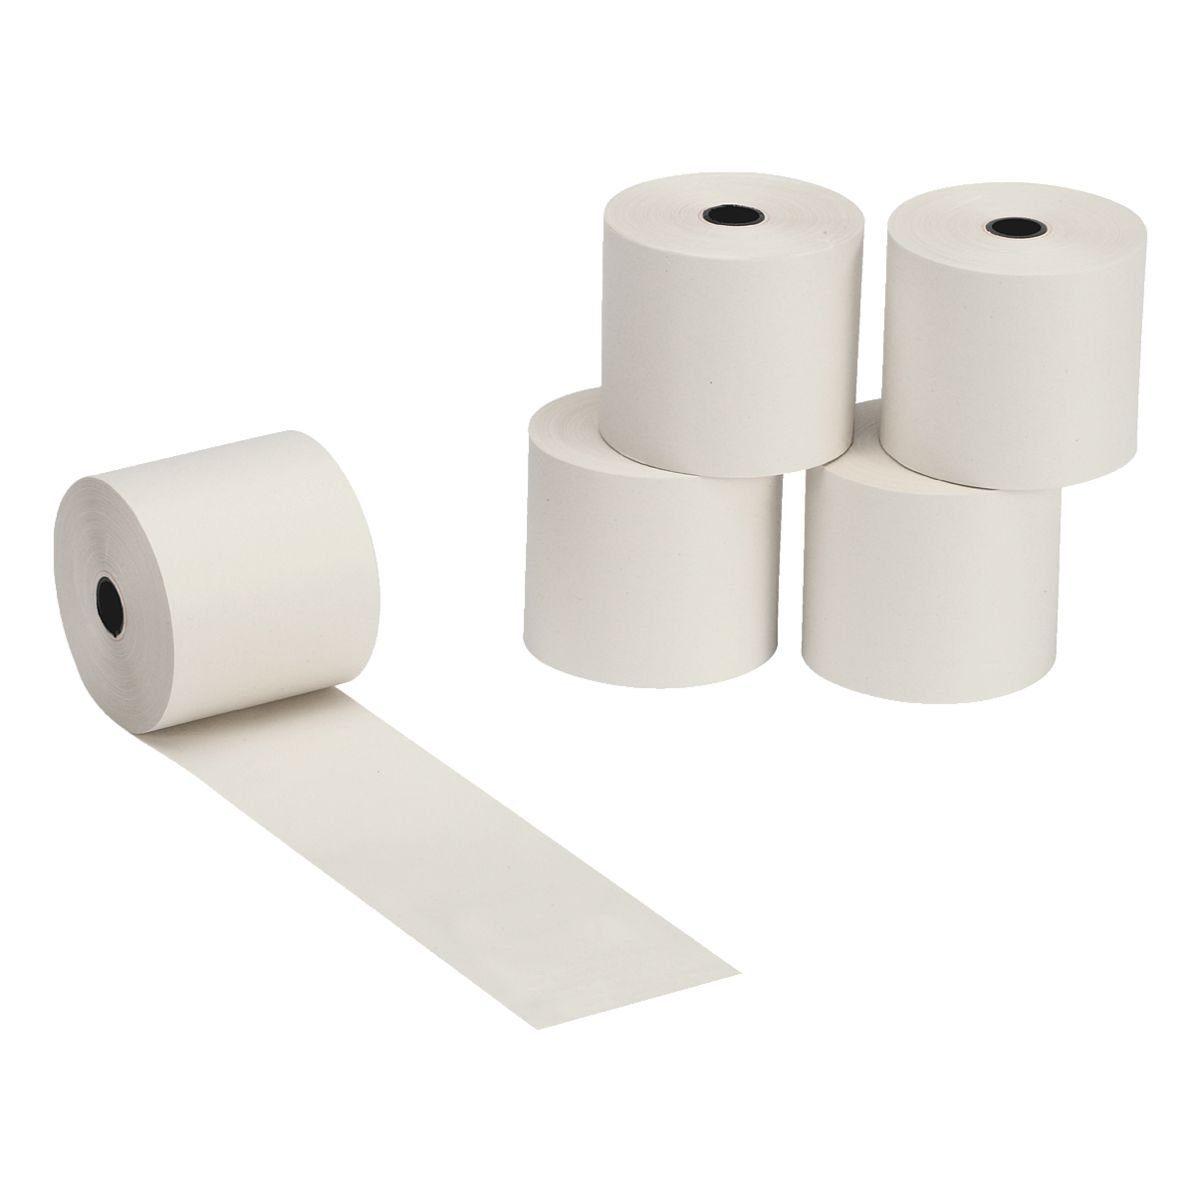 CASIO 5er-Pack Papierrolle »ROLL 57«